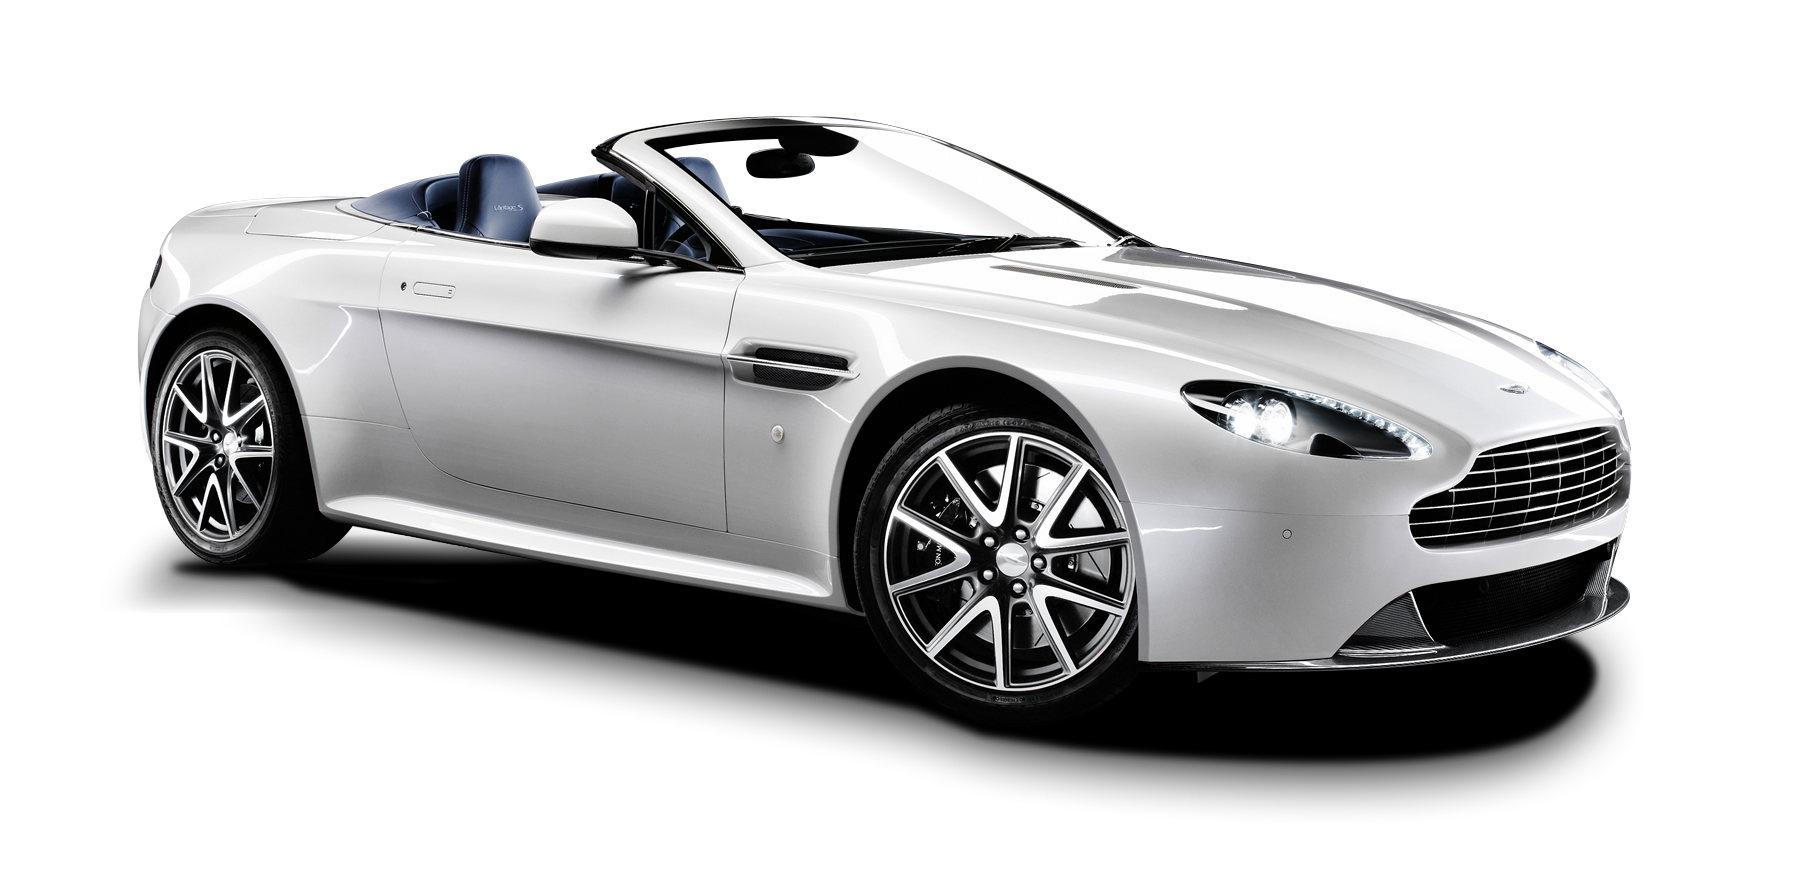 V8 Vantage S Design